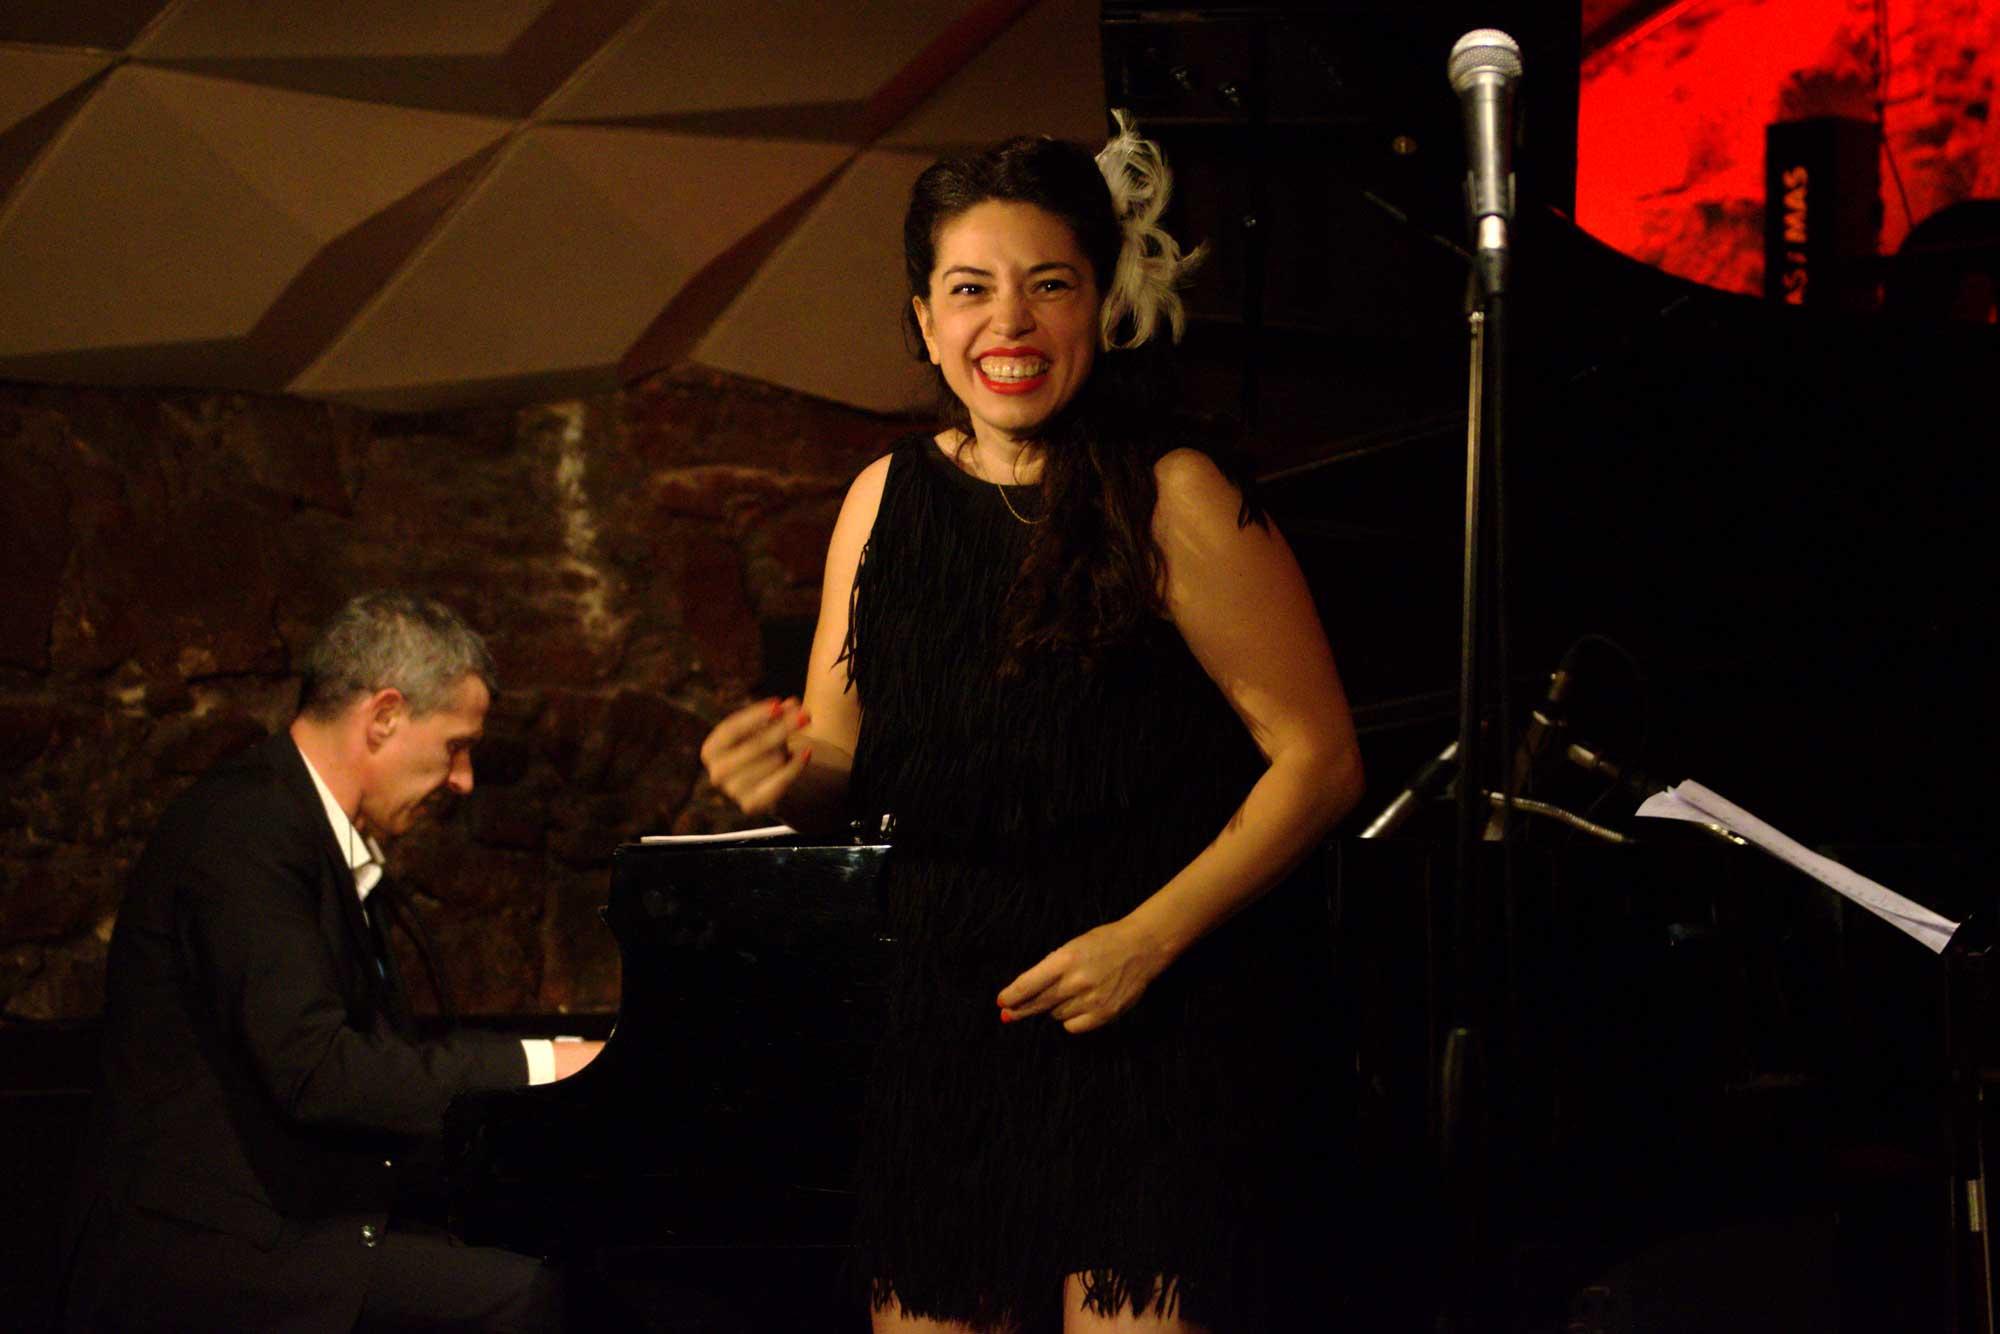 Myriam Swanson amb Magnolia actuant al Jamboree en el marc del Festival Grec.